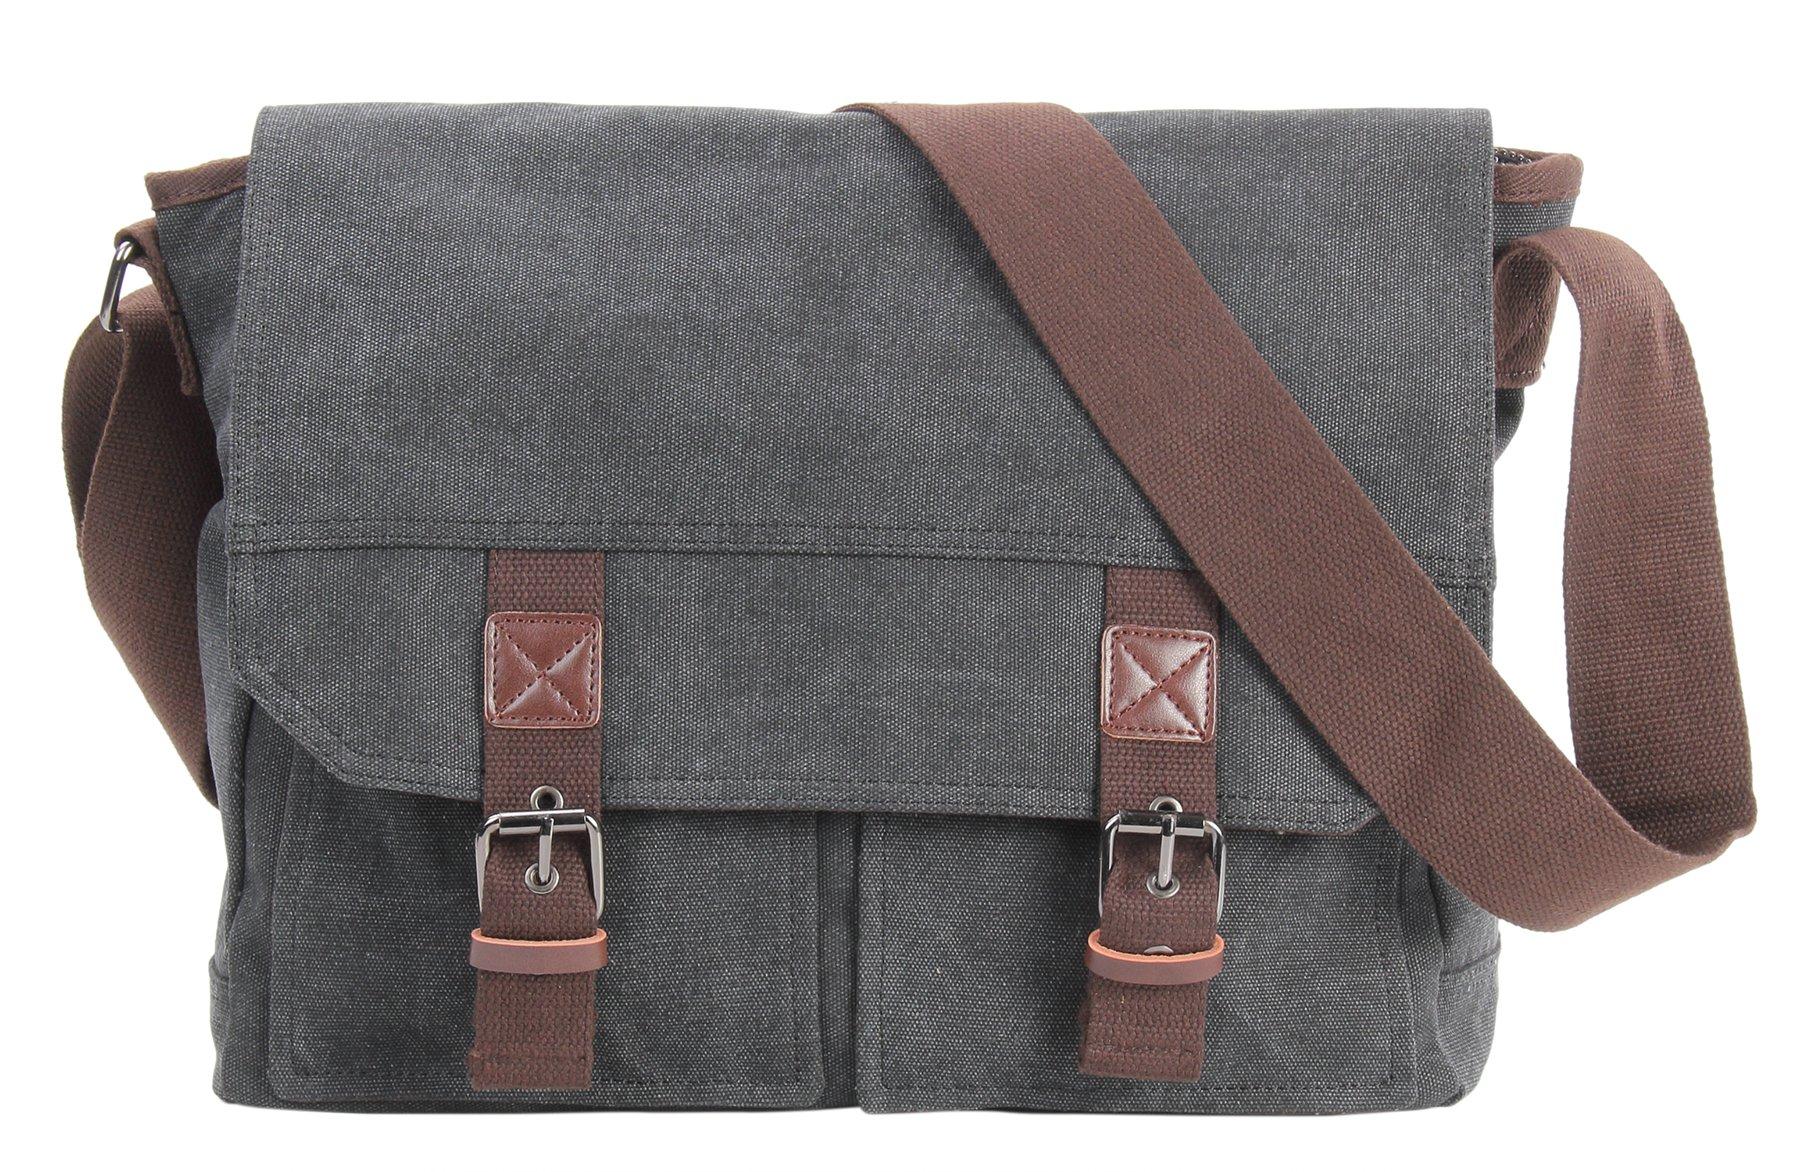 HONEYJOY Vintage Canvas Messenger Bag Laptop Shoulder Bags Classic Crossbody Pack for Men & Women (One Size, Black)